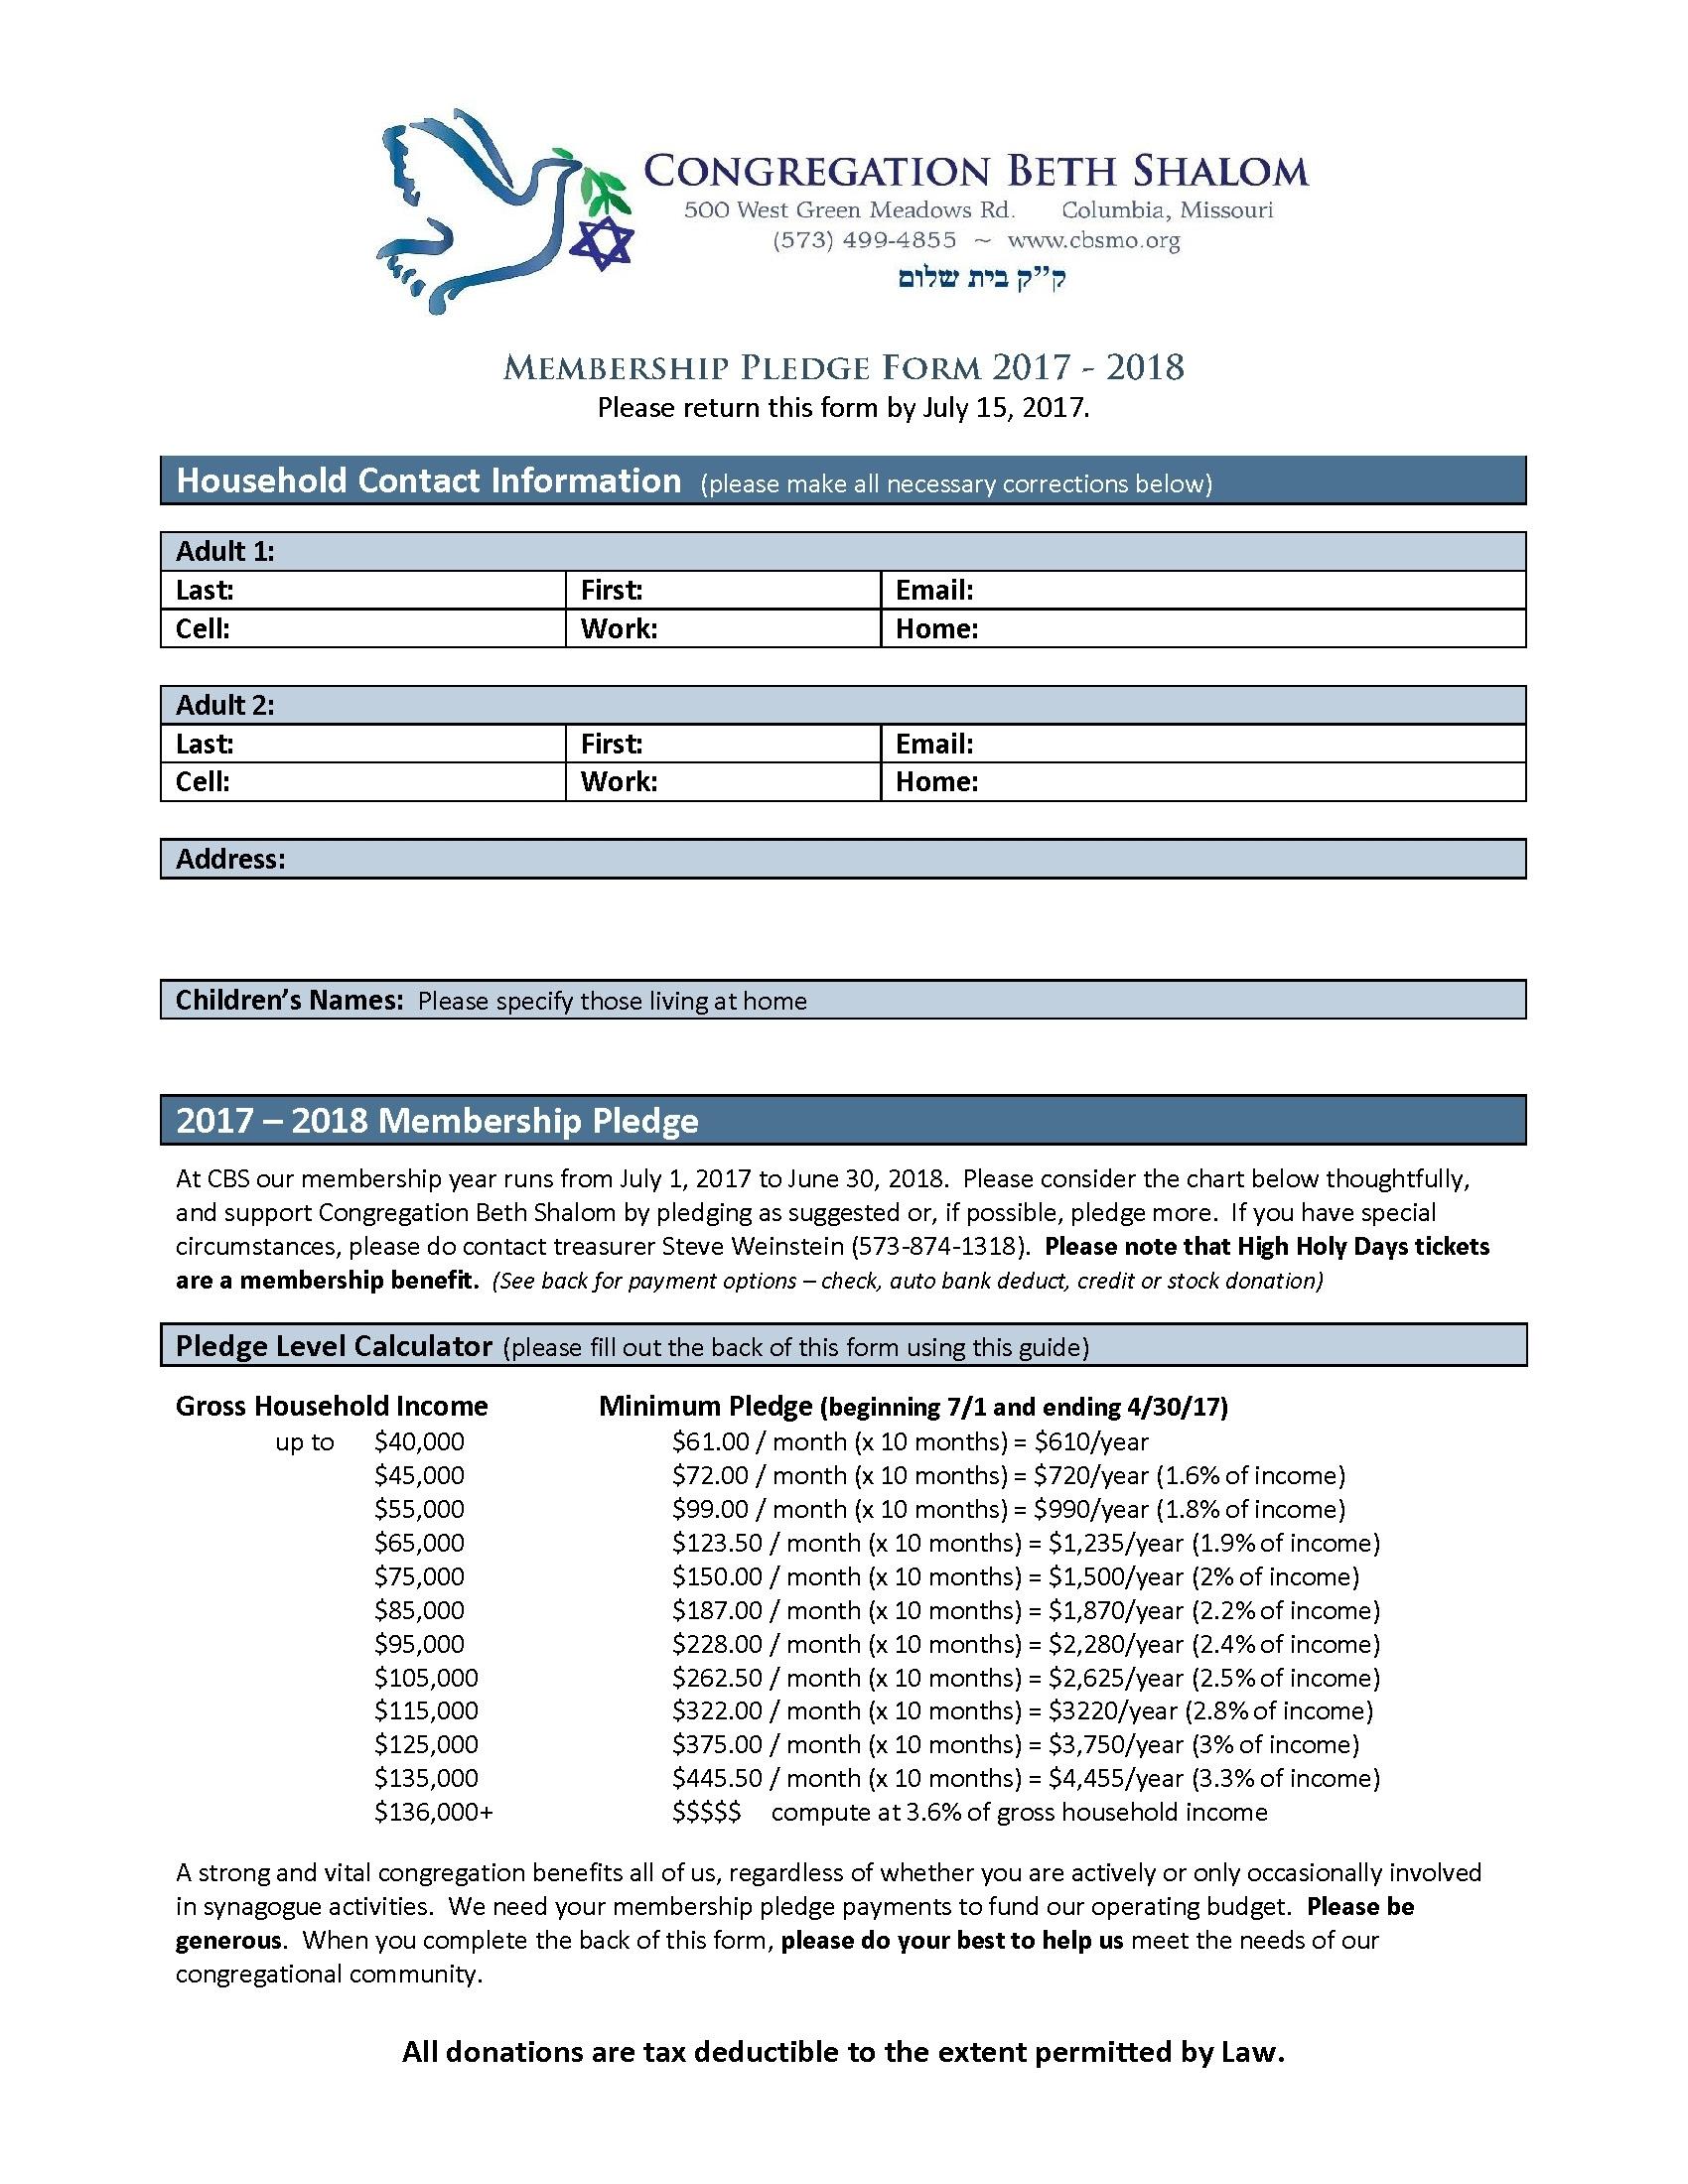 2020-2021 Membership Form